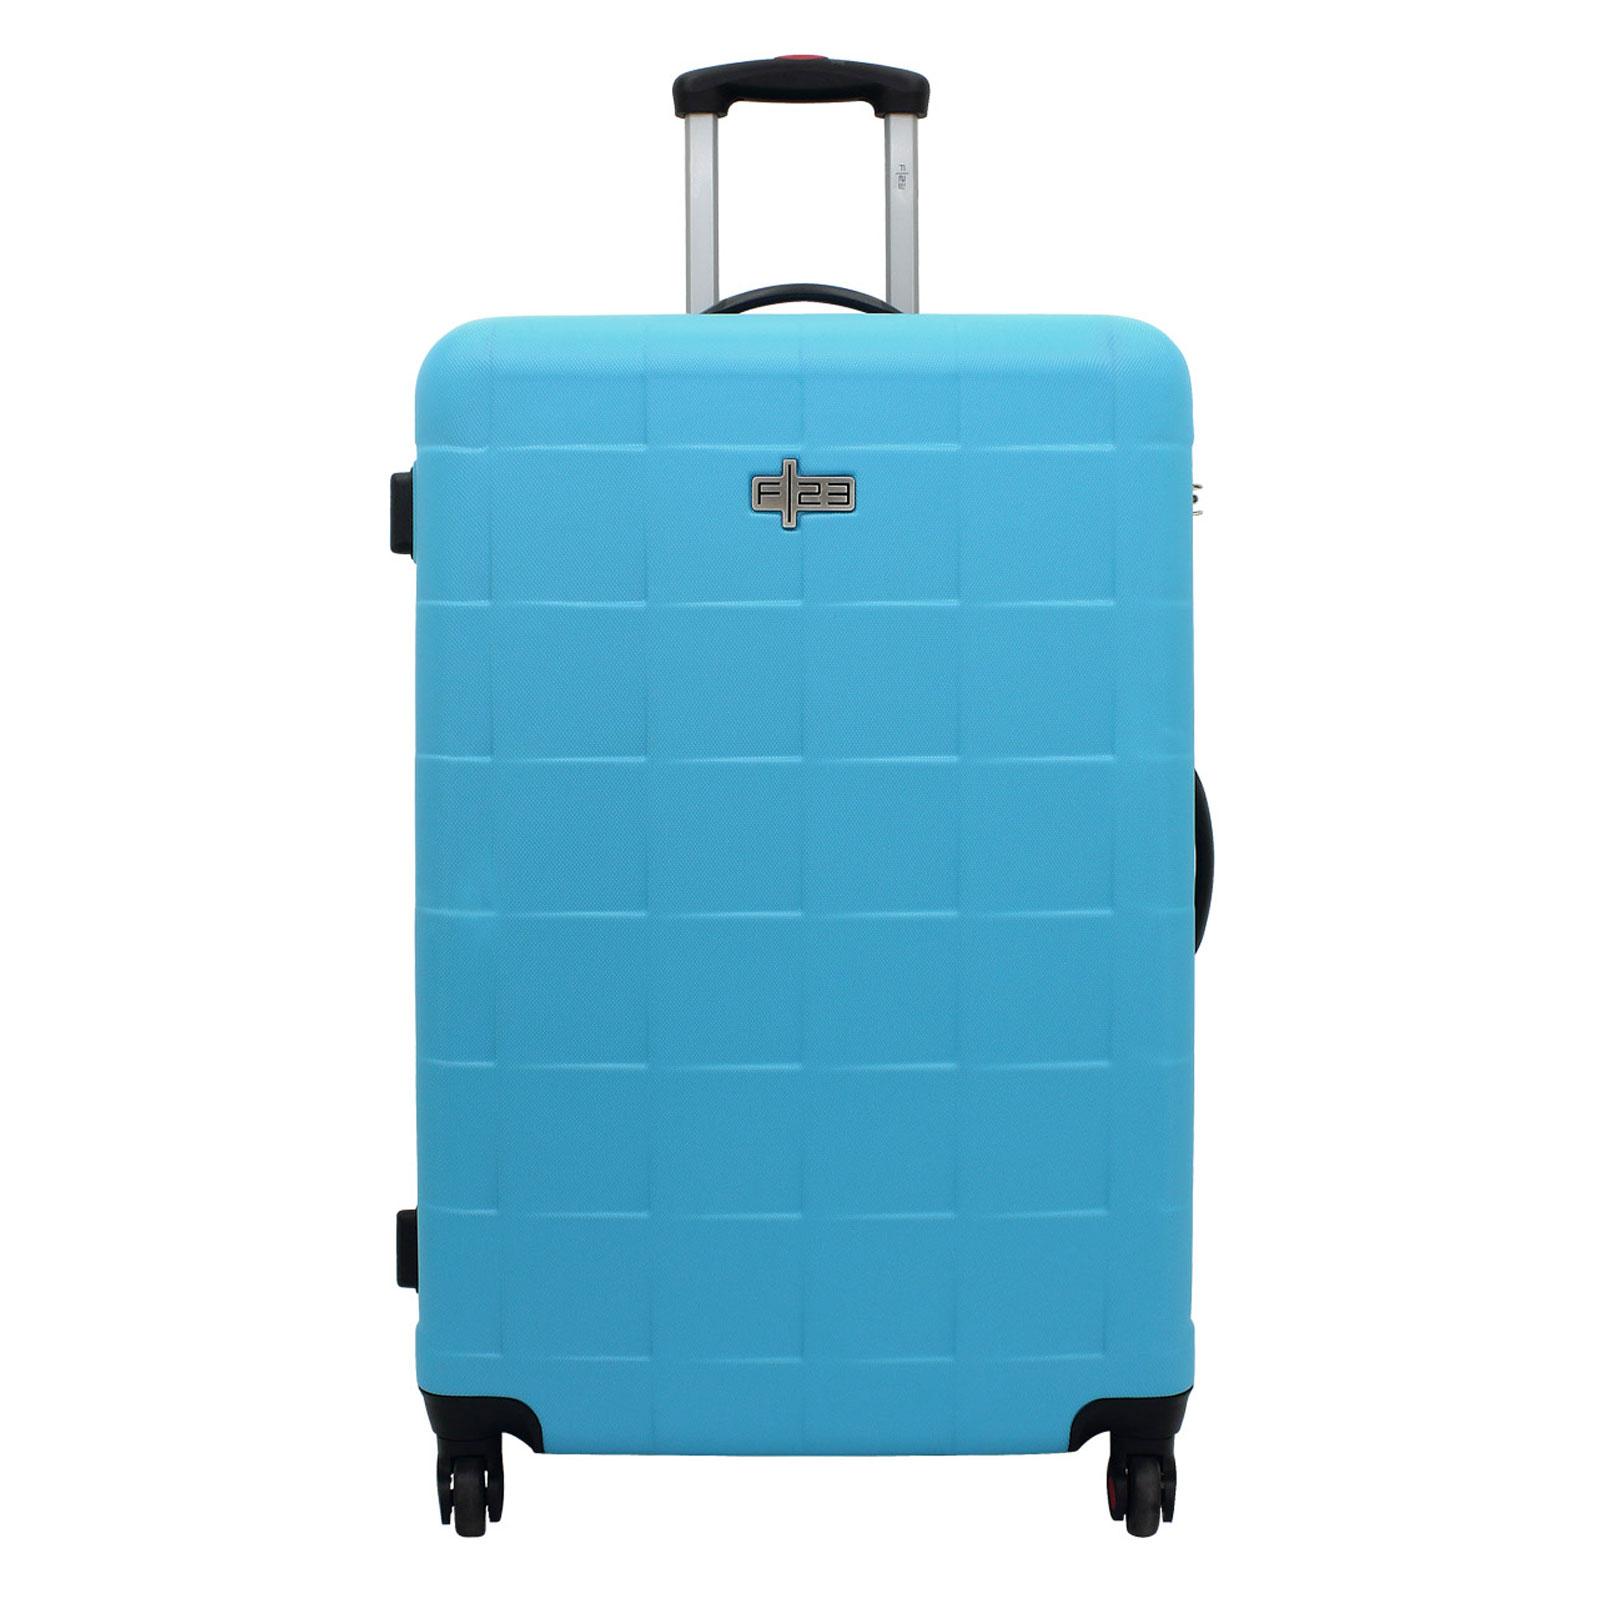 f23 wave 2 0 trolley gro g nstig kaufen koffermarkt. Black Bedroom Furniture Sets. Home Design Ideas